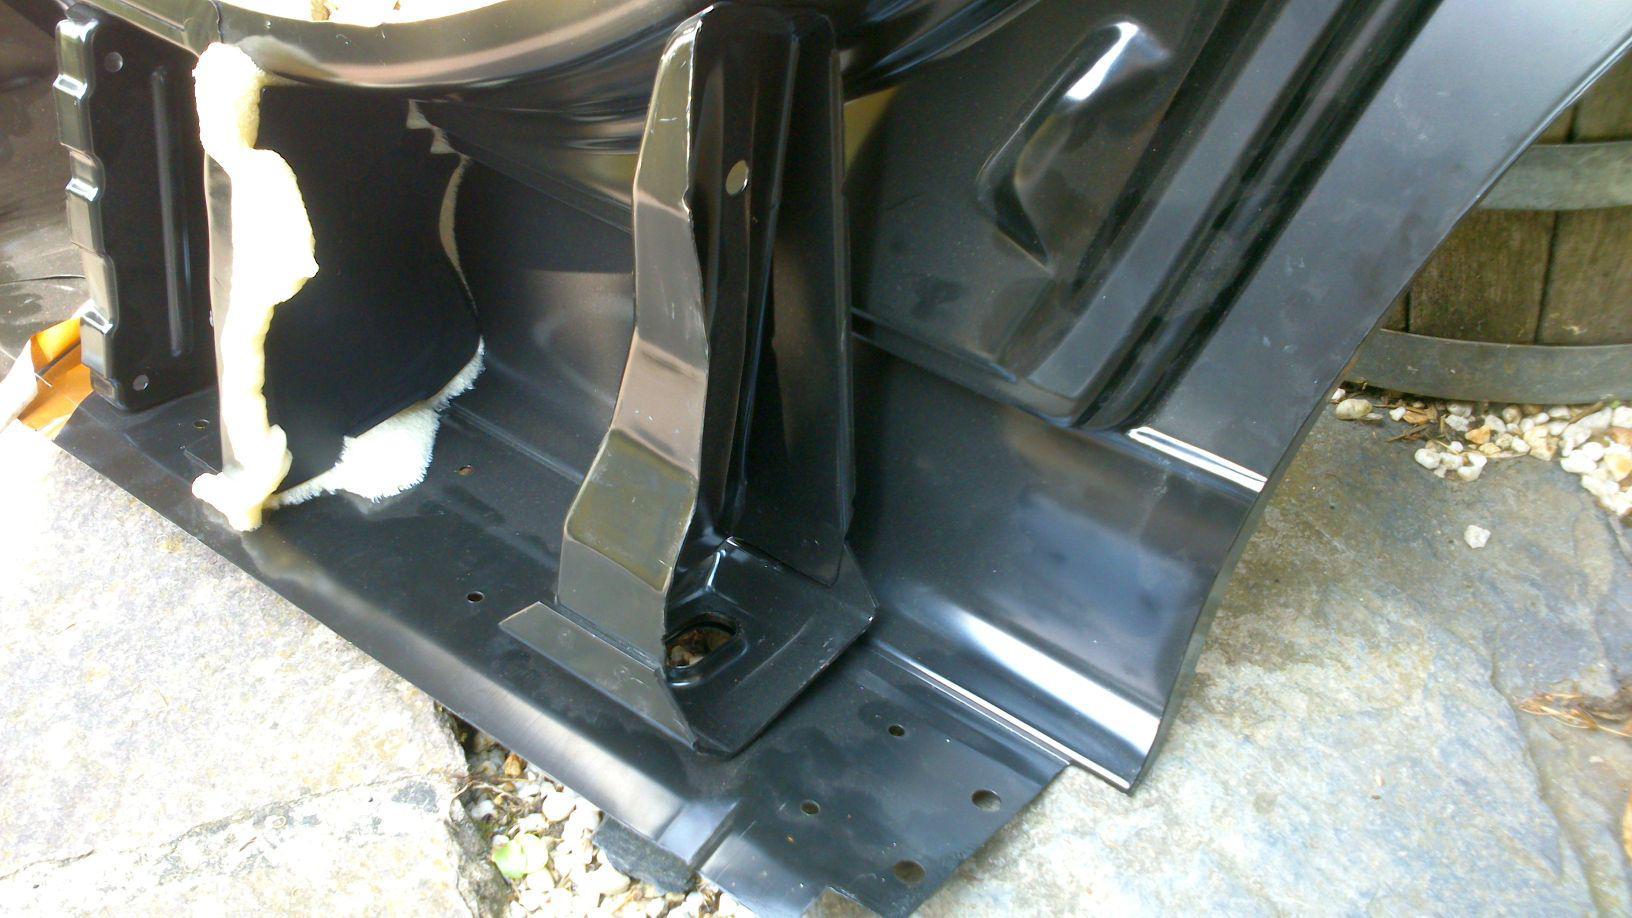 Reparaturbleche Wagenheberaufnahmen Rund Um Den E39